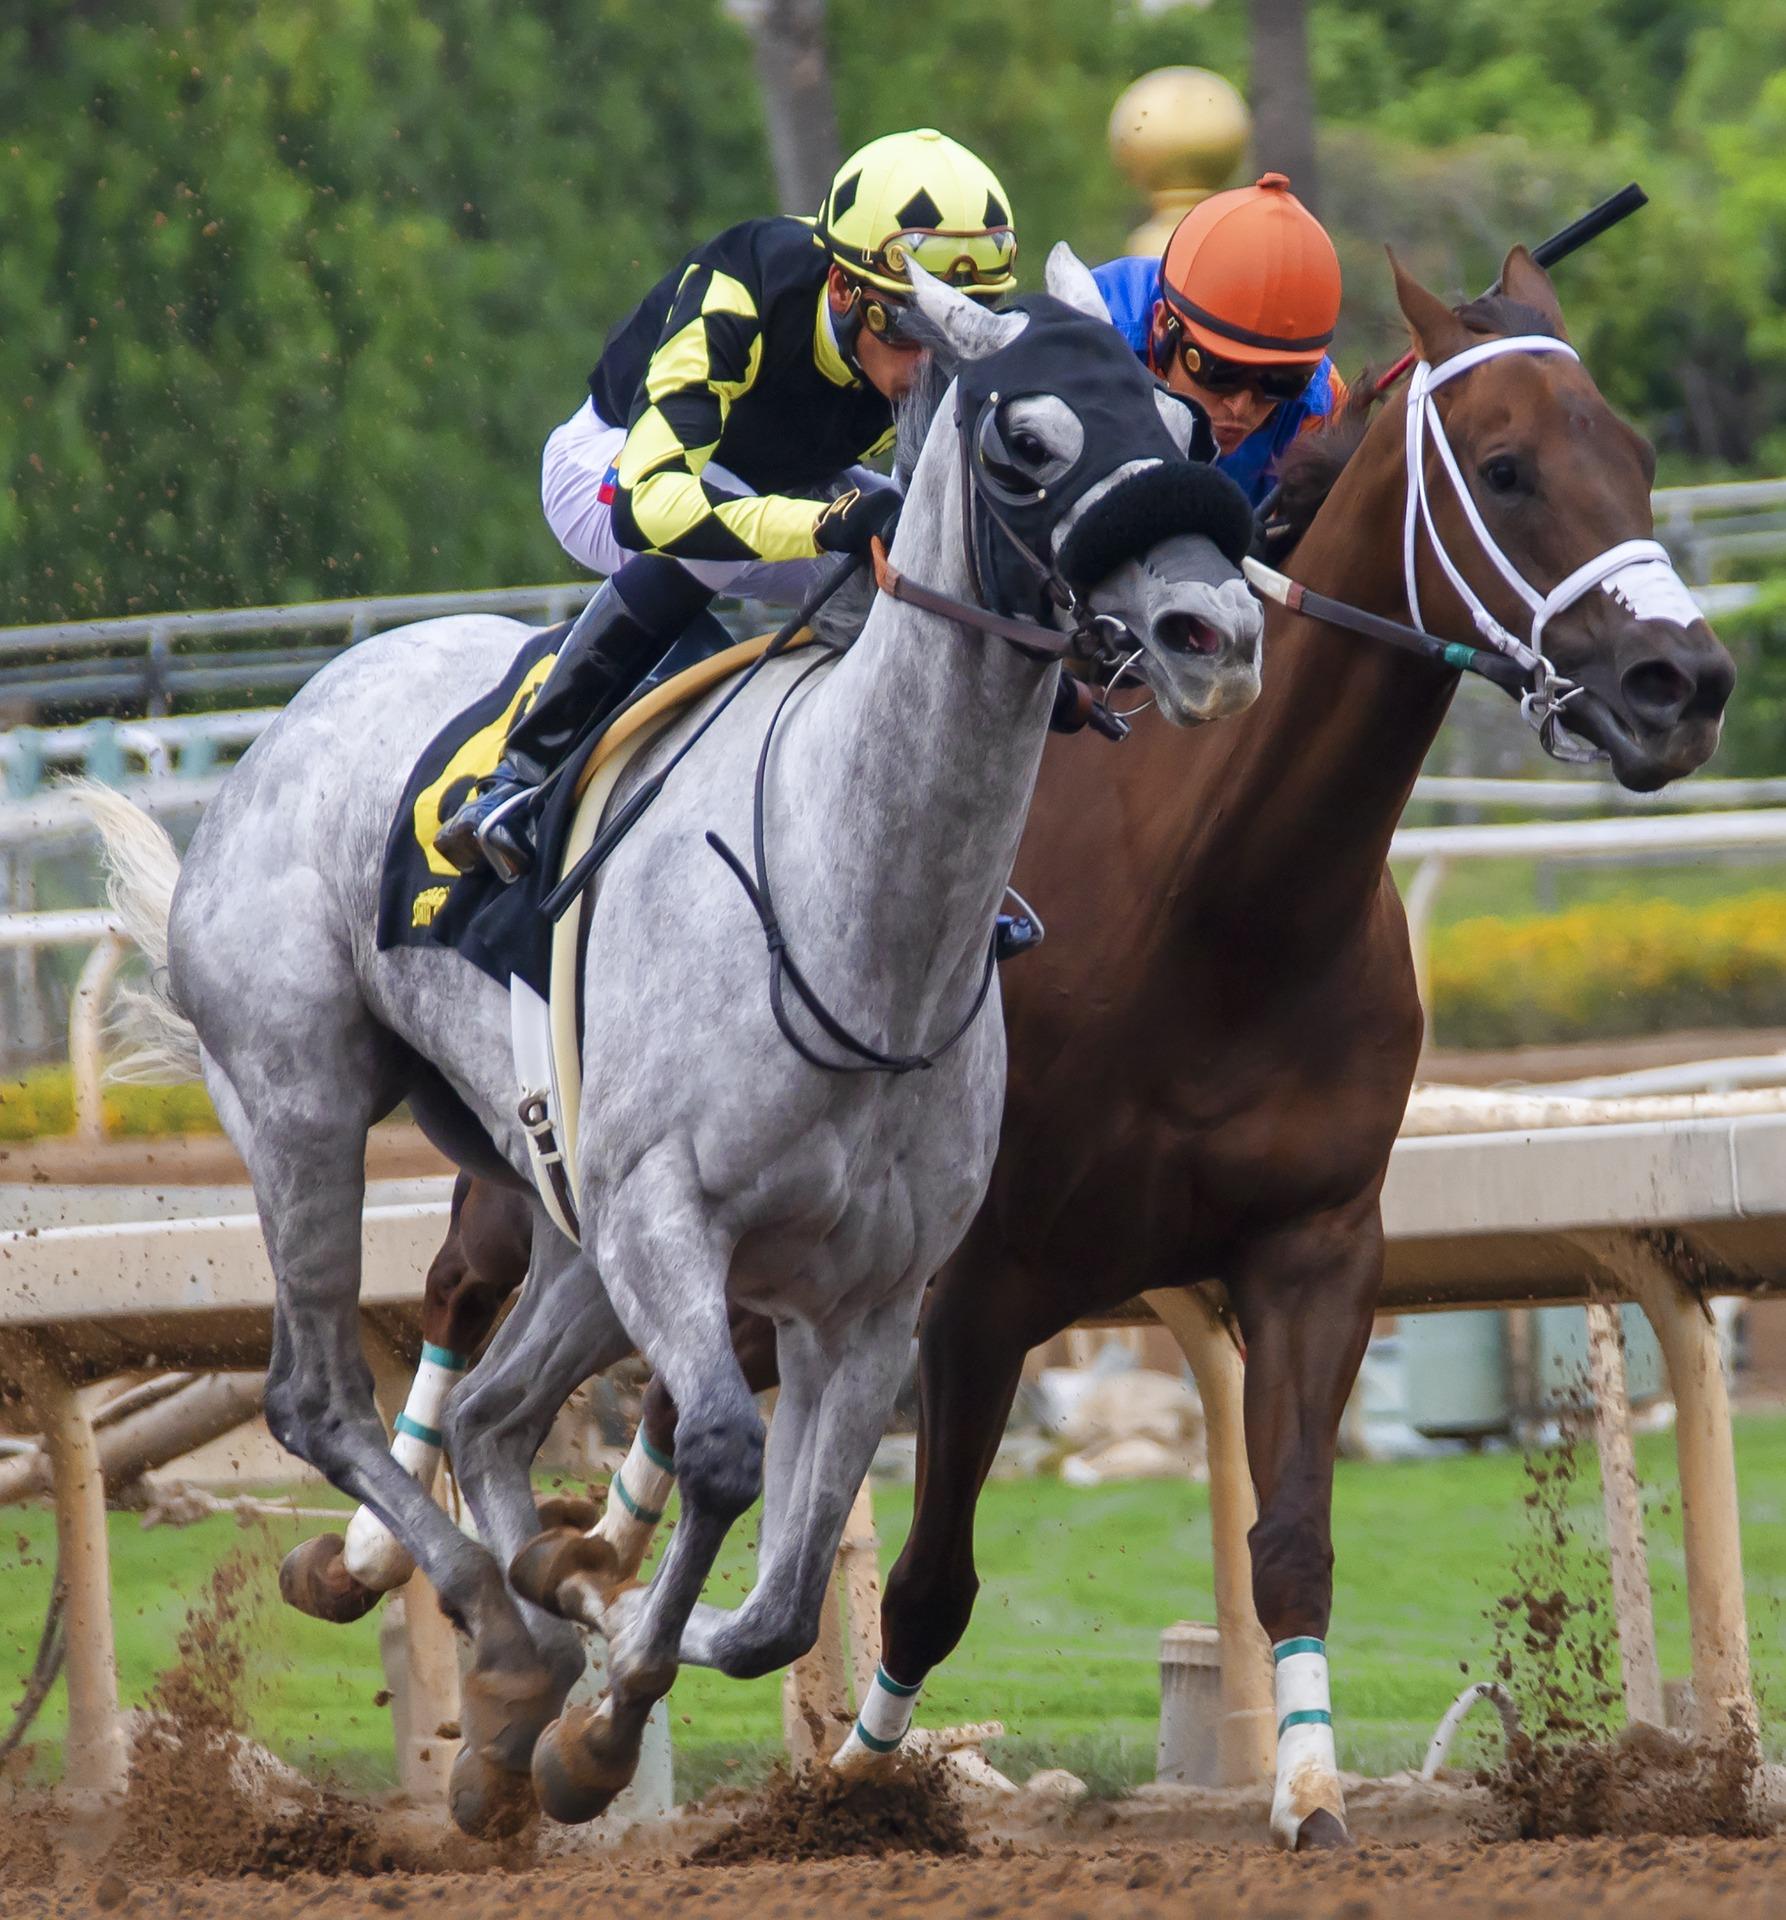 horses 3817727 1920